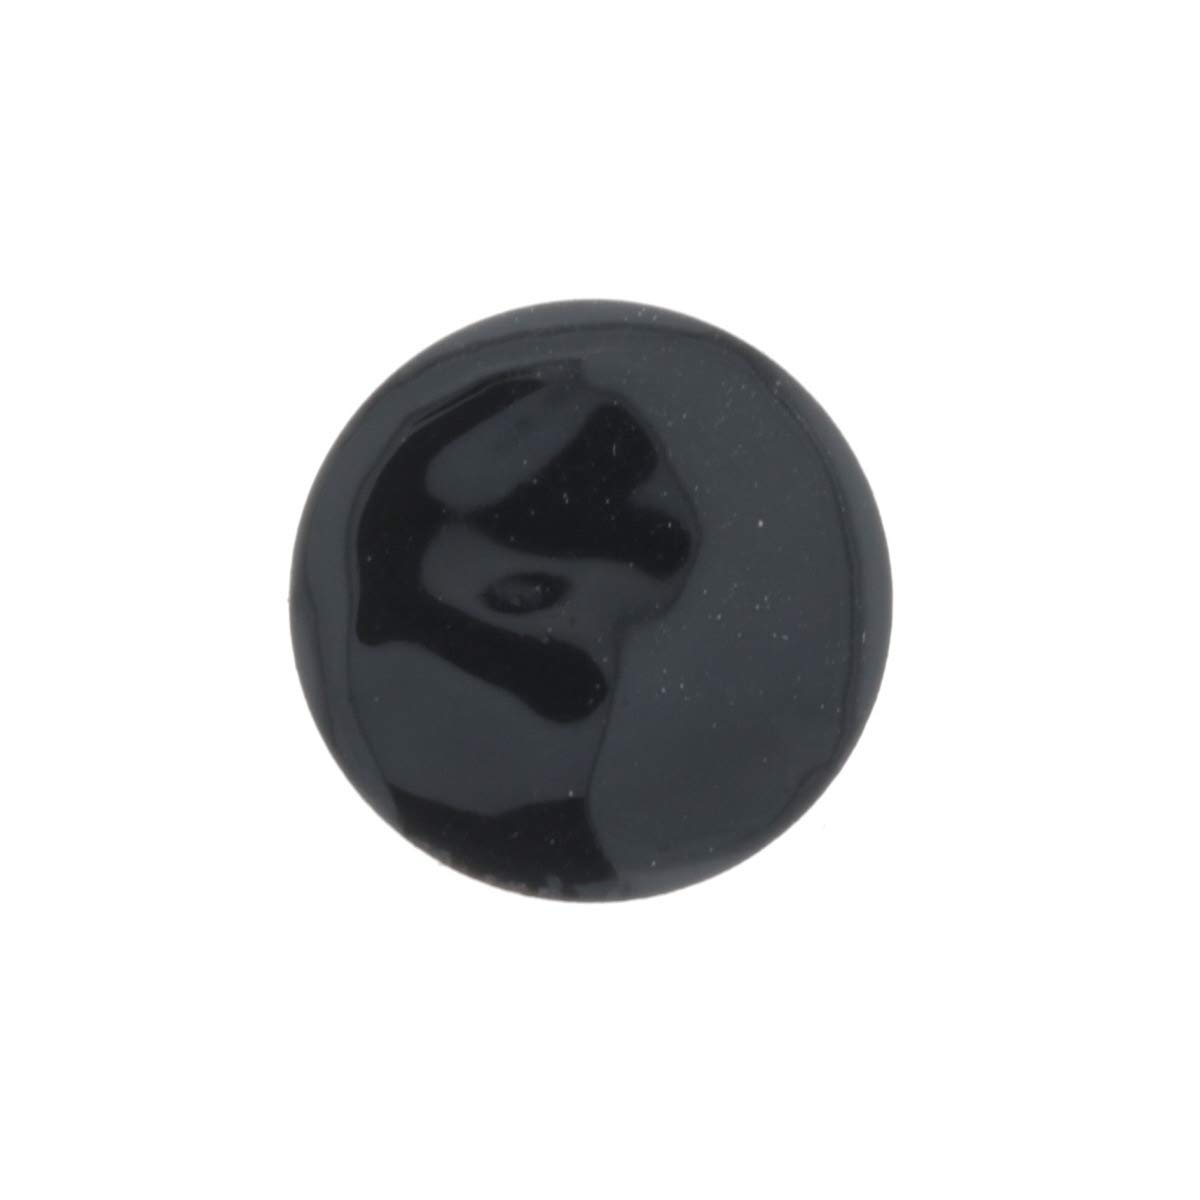 WireJewelry 1995 Black Thompson Opaque Enamel - 8 Ounce by WireJewelry